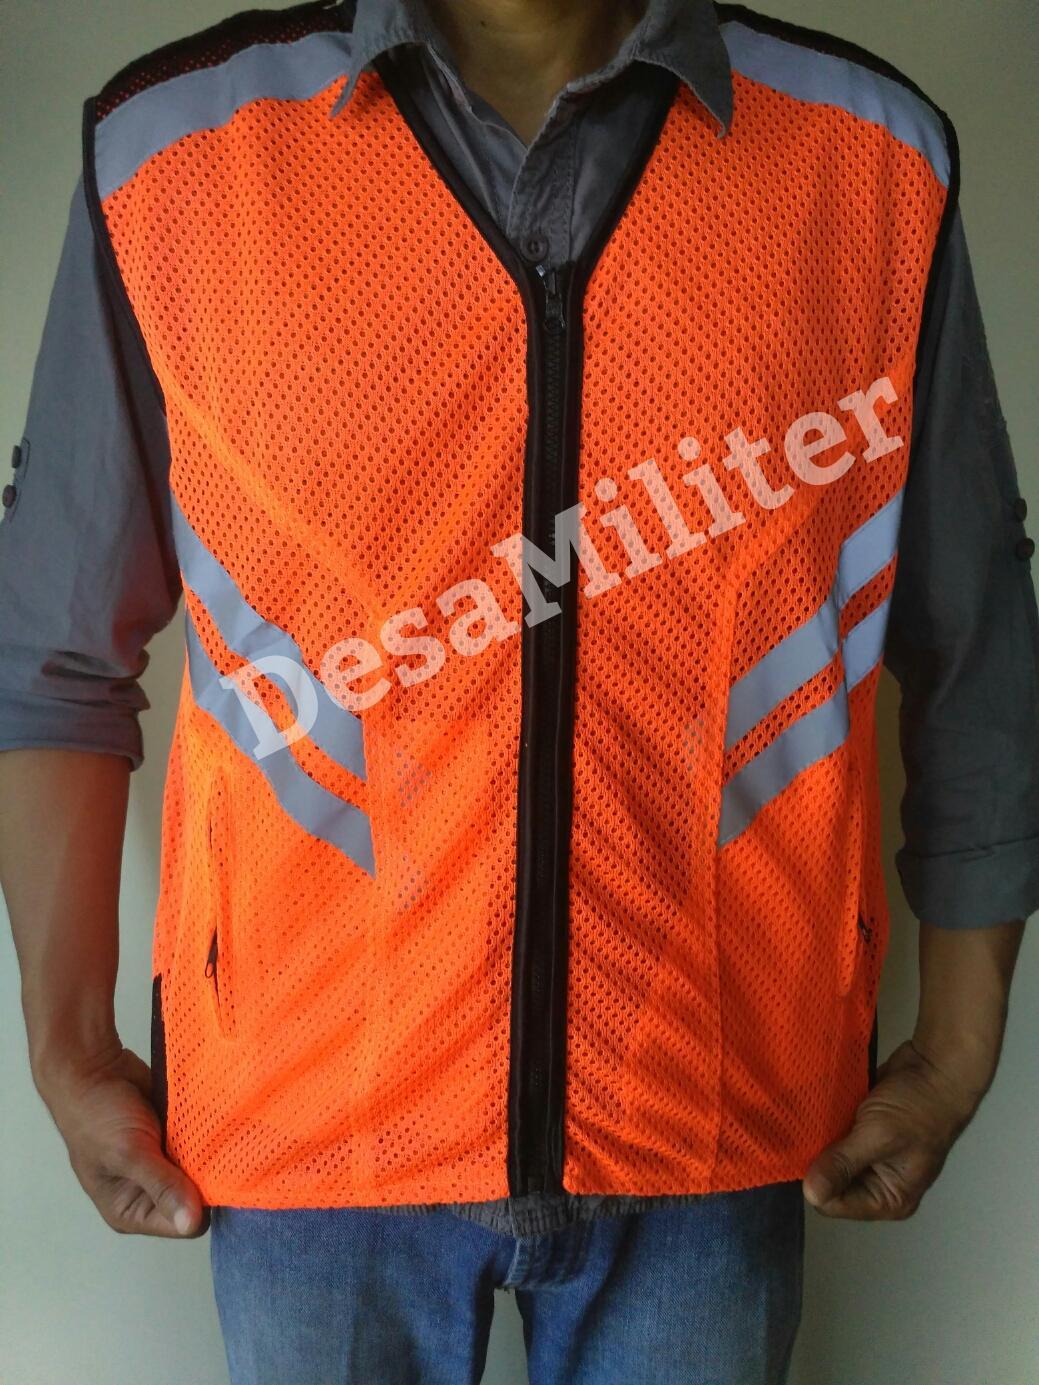 Rompi Safety Orange - Rompi Proyek - Security - Rompi Jaring - Satpam -  Rompi Touring 96d67f1c5f